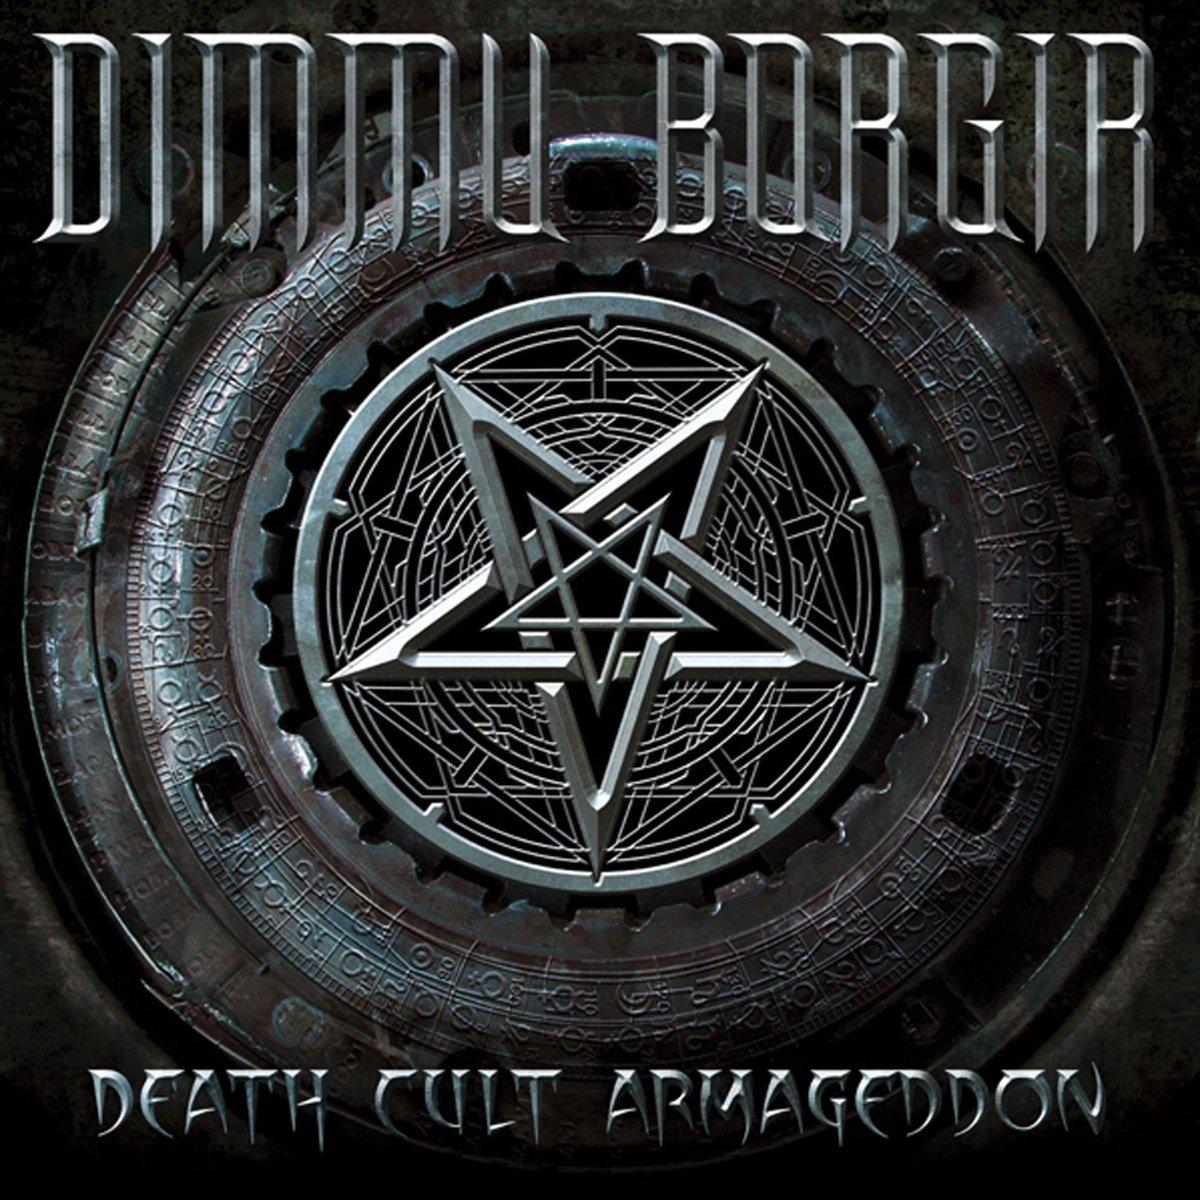 Death Cult Armageddon [Vinyl]